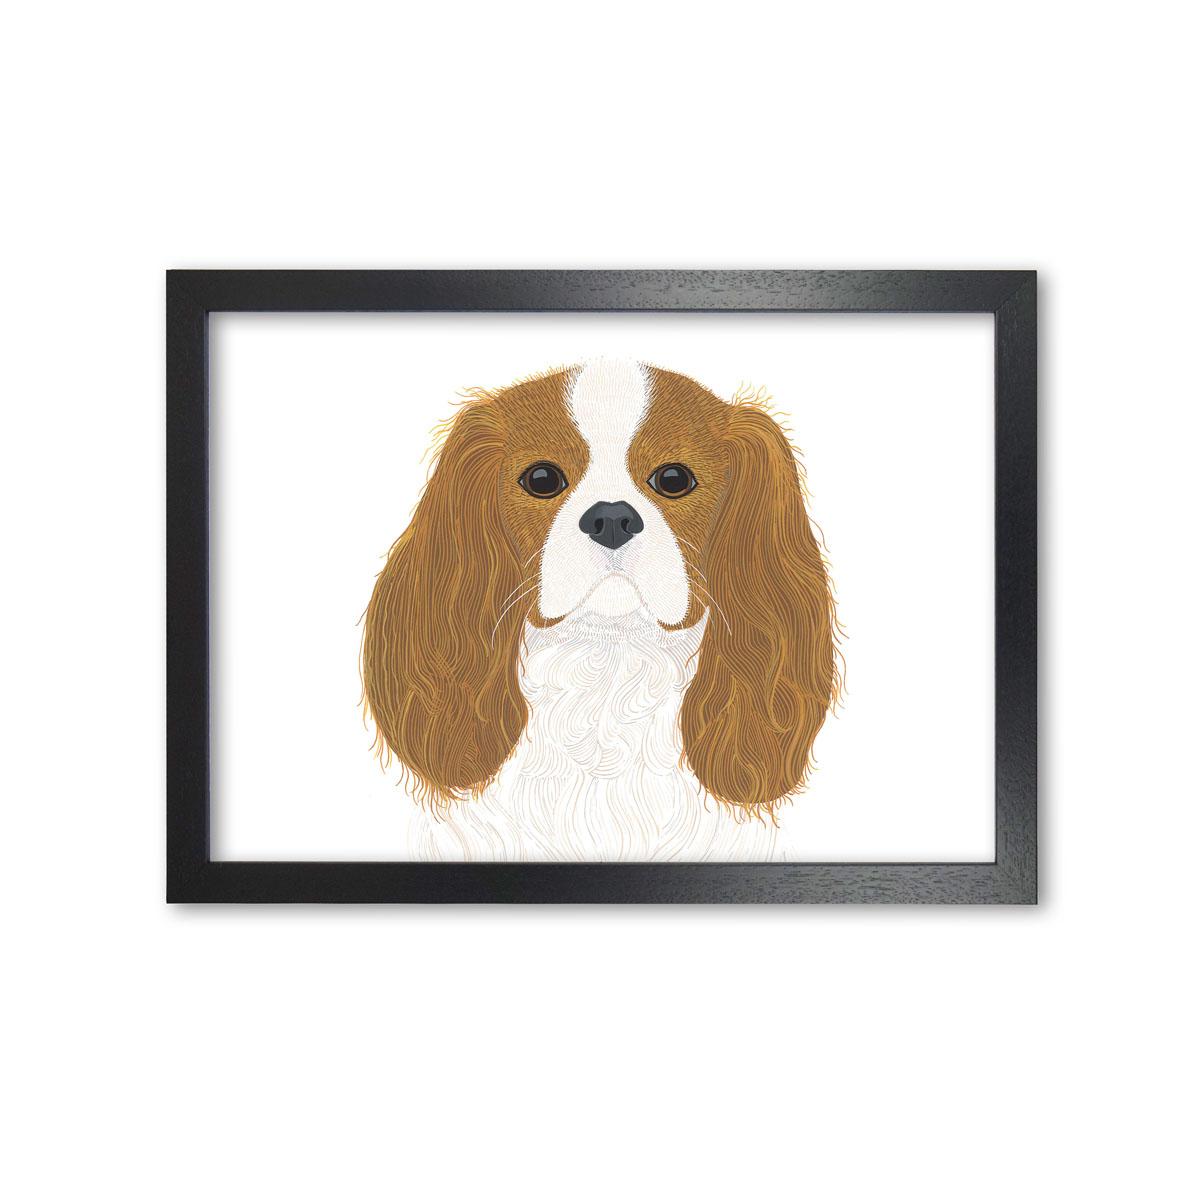 Cavalier King Charles Spaniel Dog Art Print By Bird The Artist